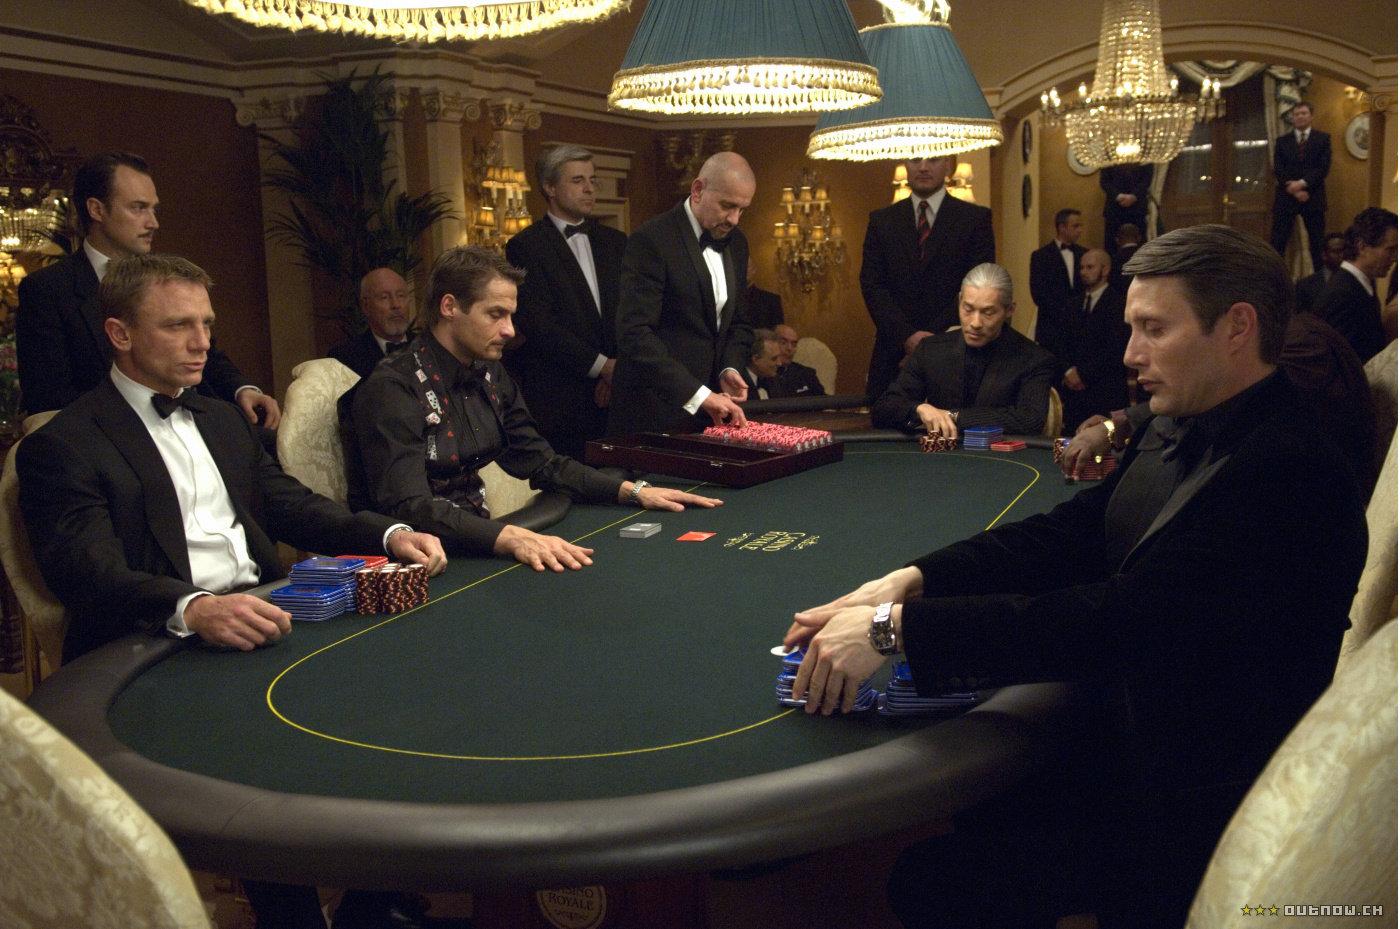 James Bond Casino Royale Coursework